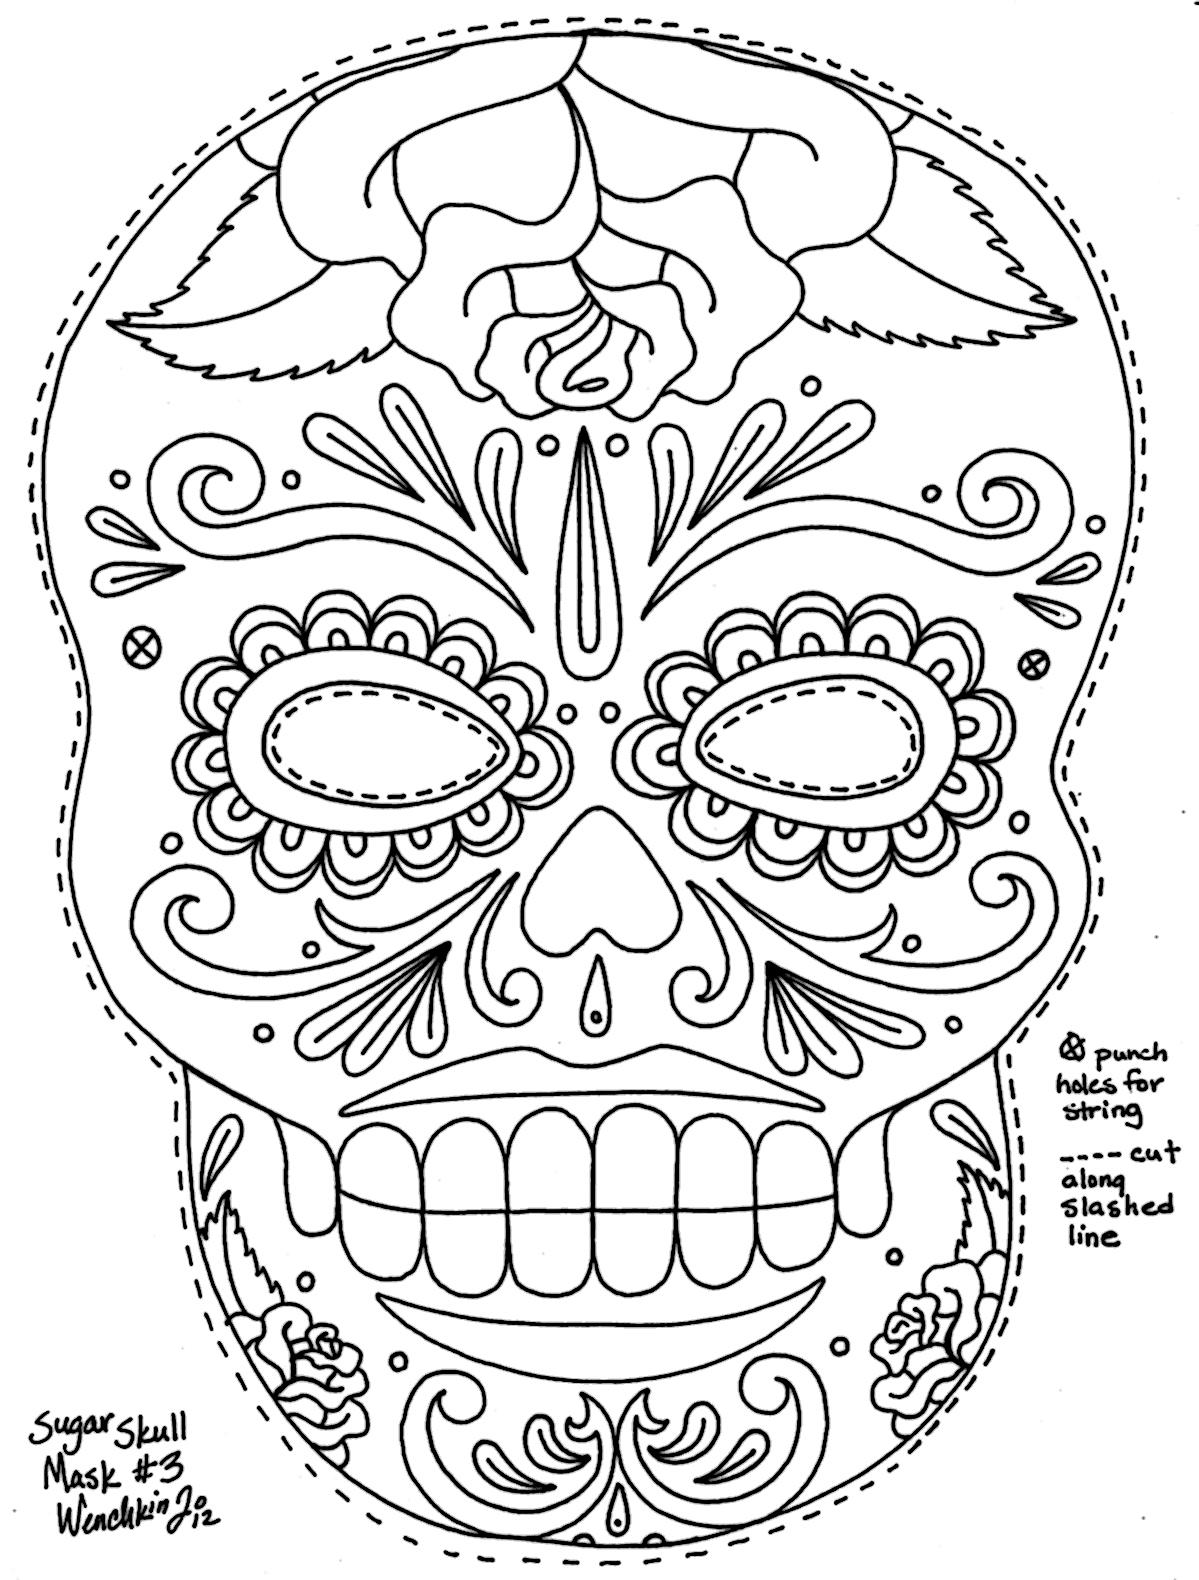 1199x1580 A Great Sugar Skull Mask Template Fun To Color Fun To Wear